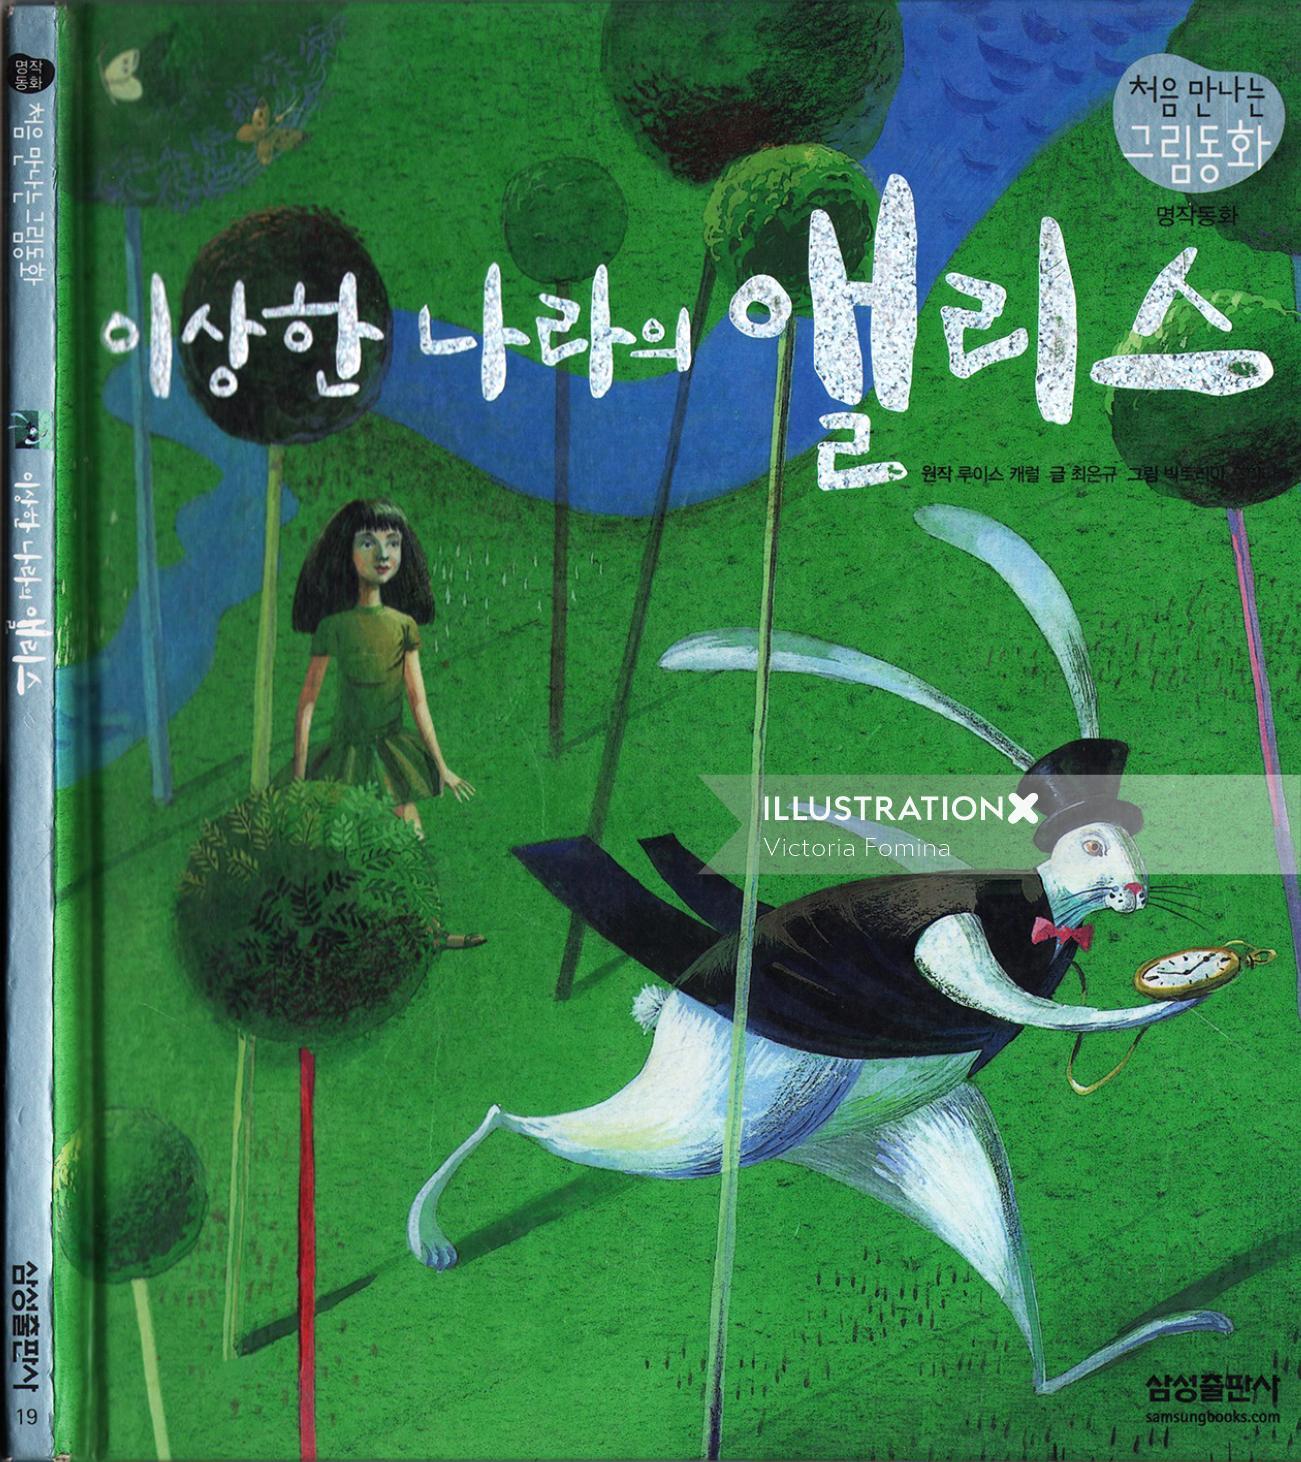 Book cover design of children book